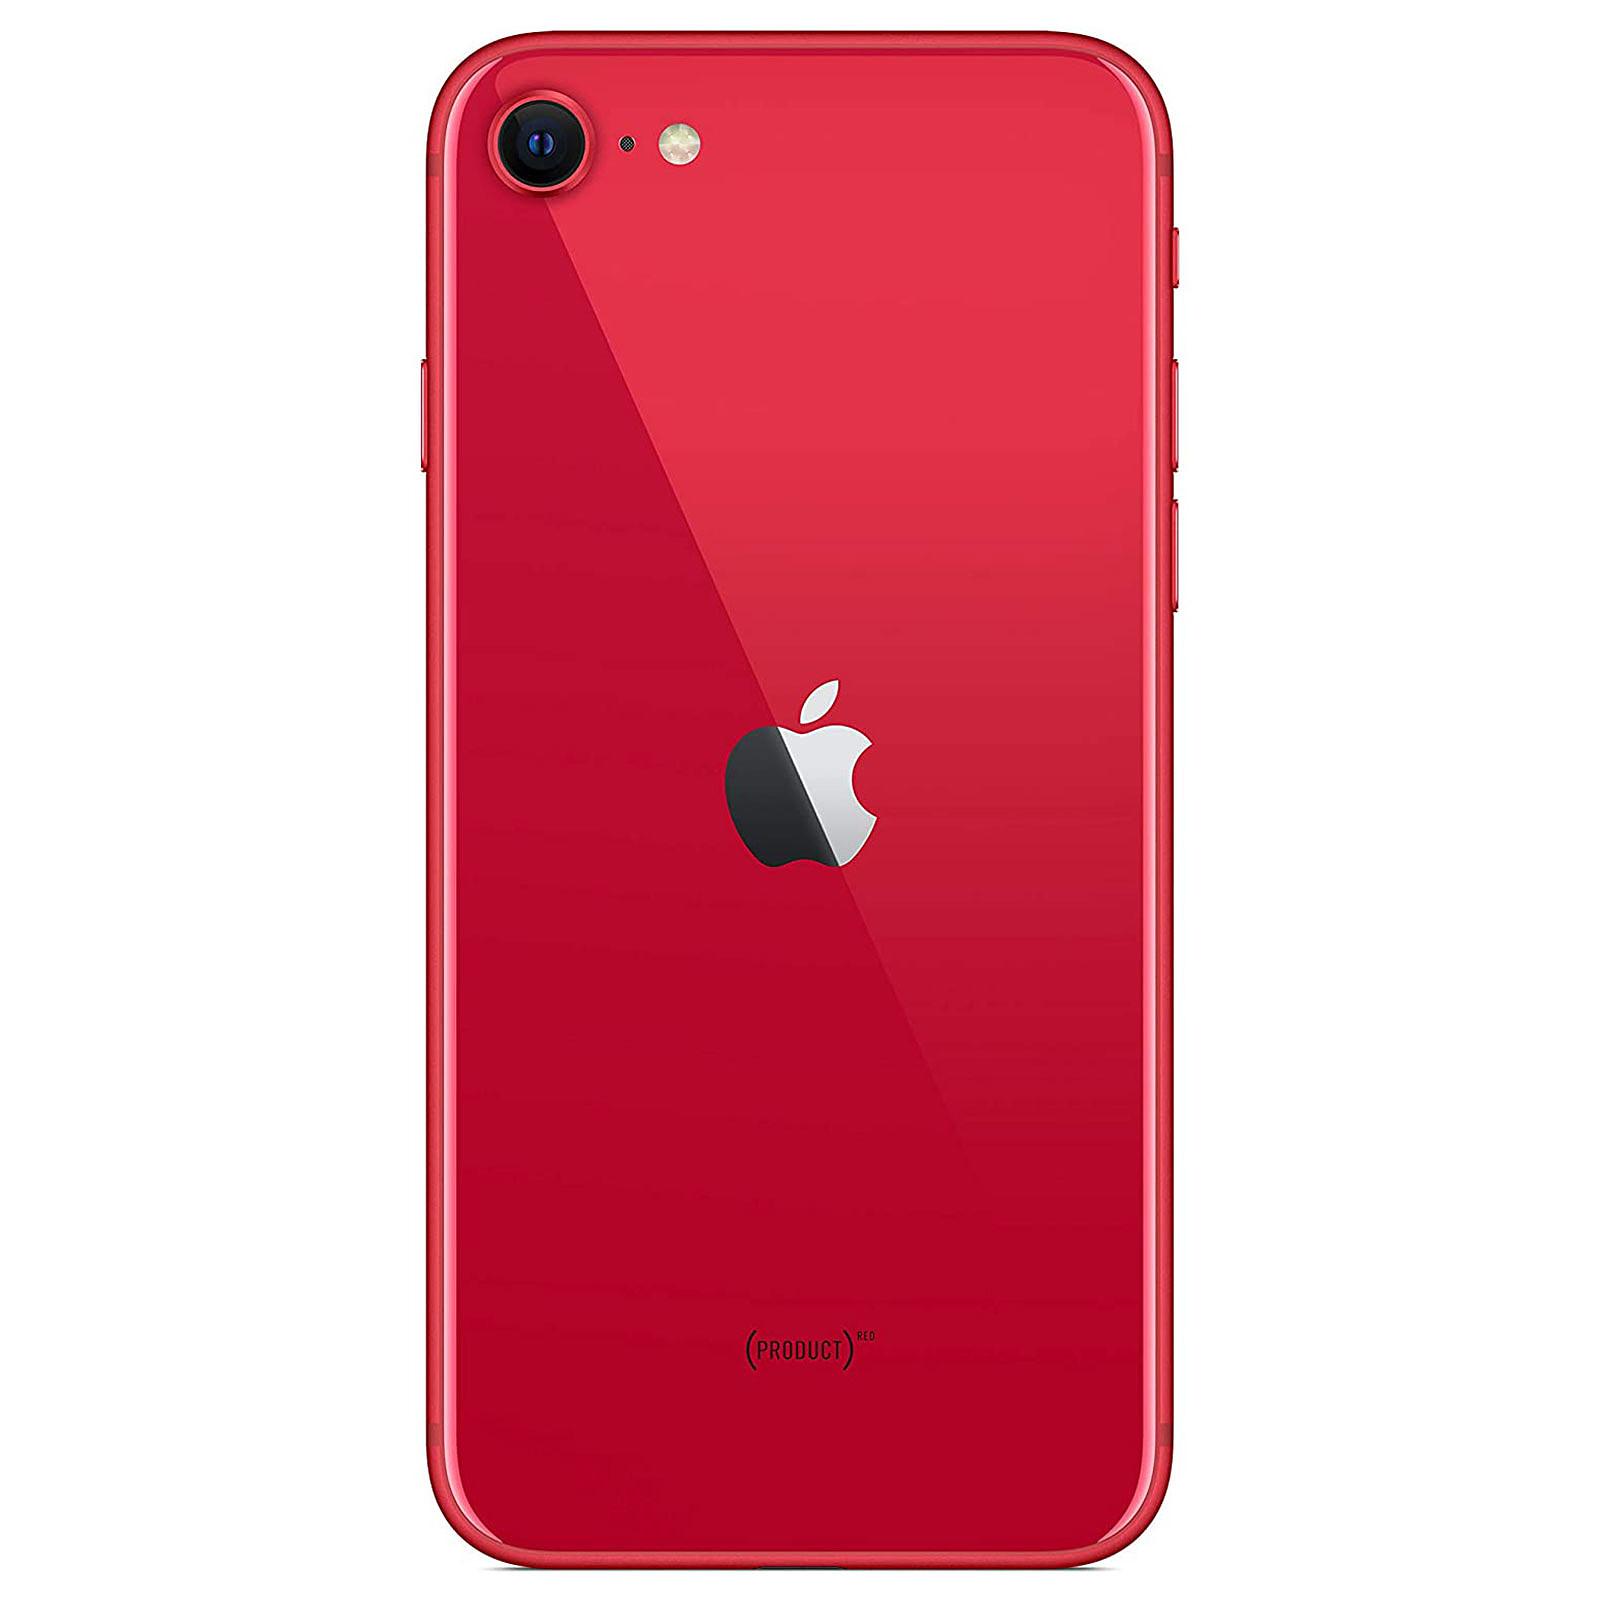 iPhone : pourquoi choisir Apple ?